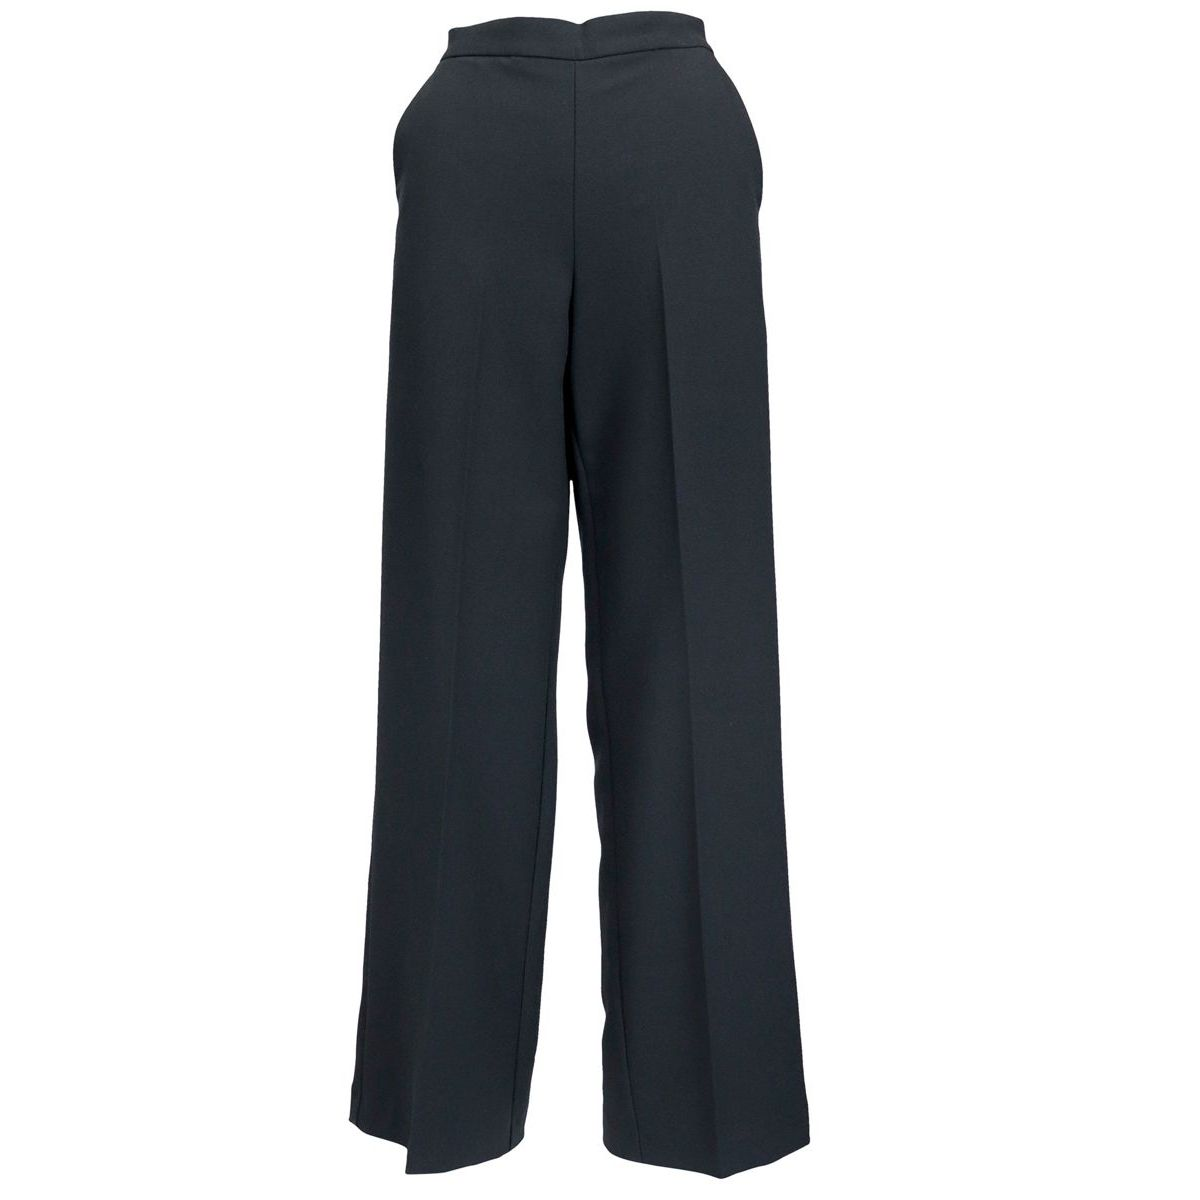 Pantalon large avec pli pressé en tissu sablé Noir Maliparmi